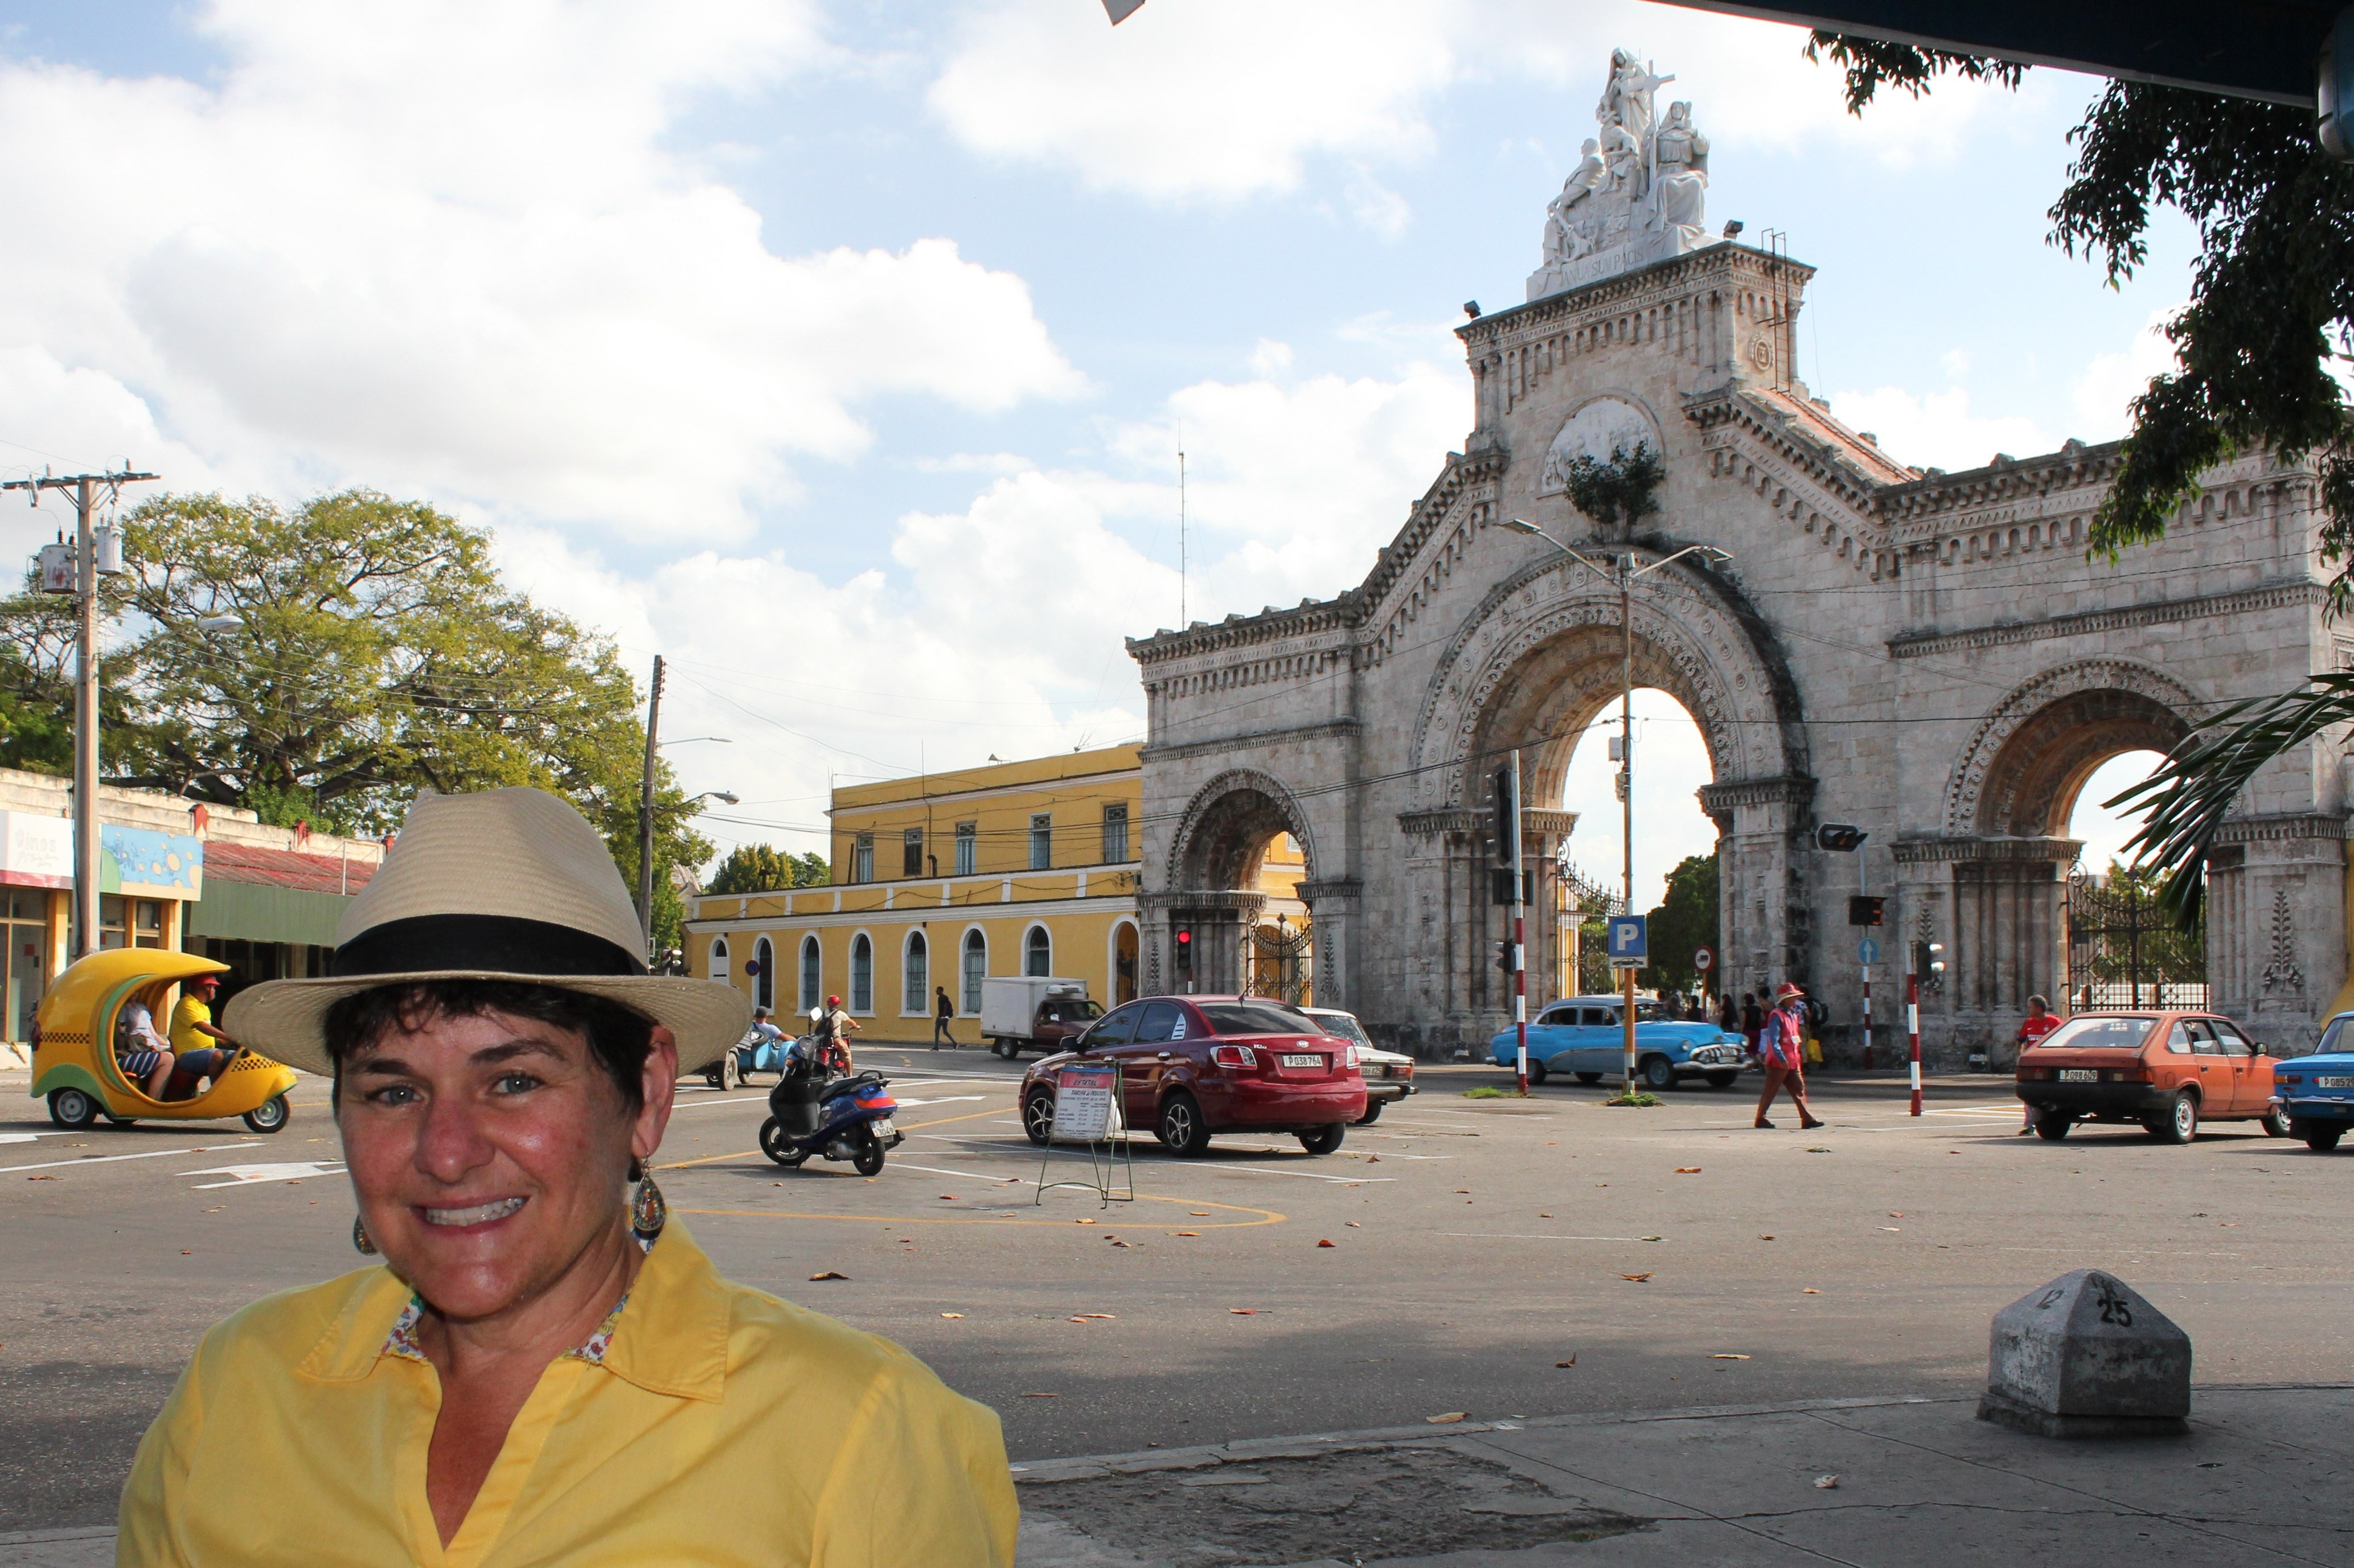 outside_entrance_colon_cemetery_havana Havana has cemetery stories, too Cuba